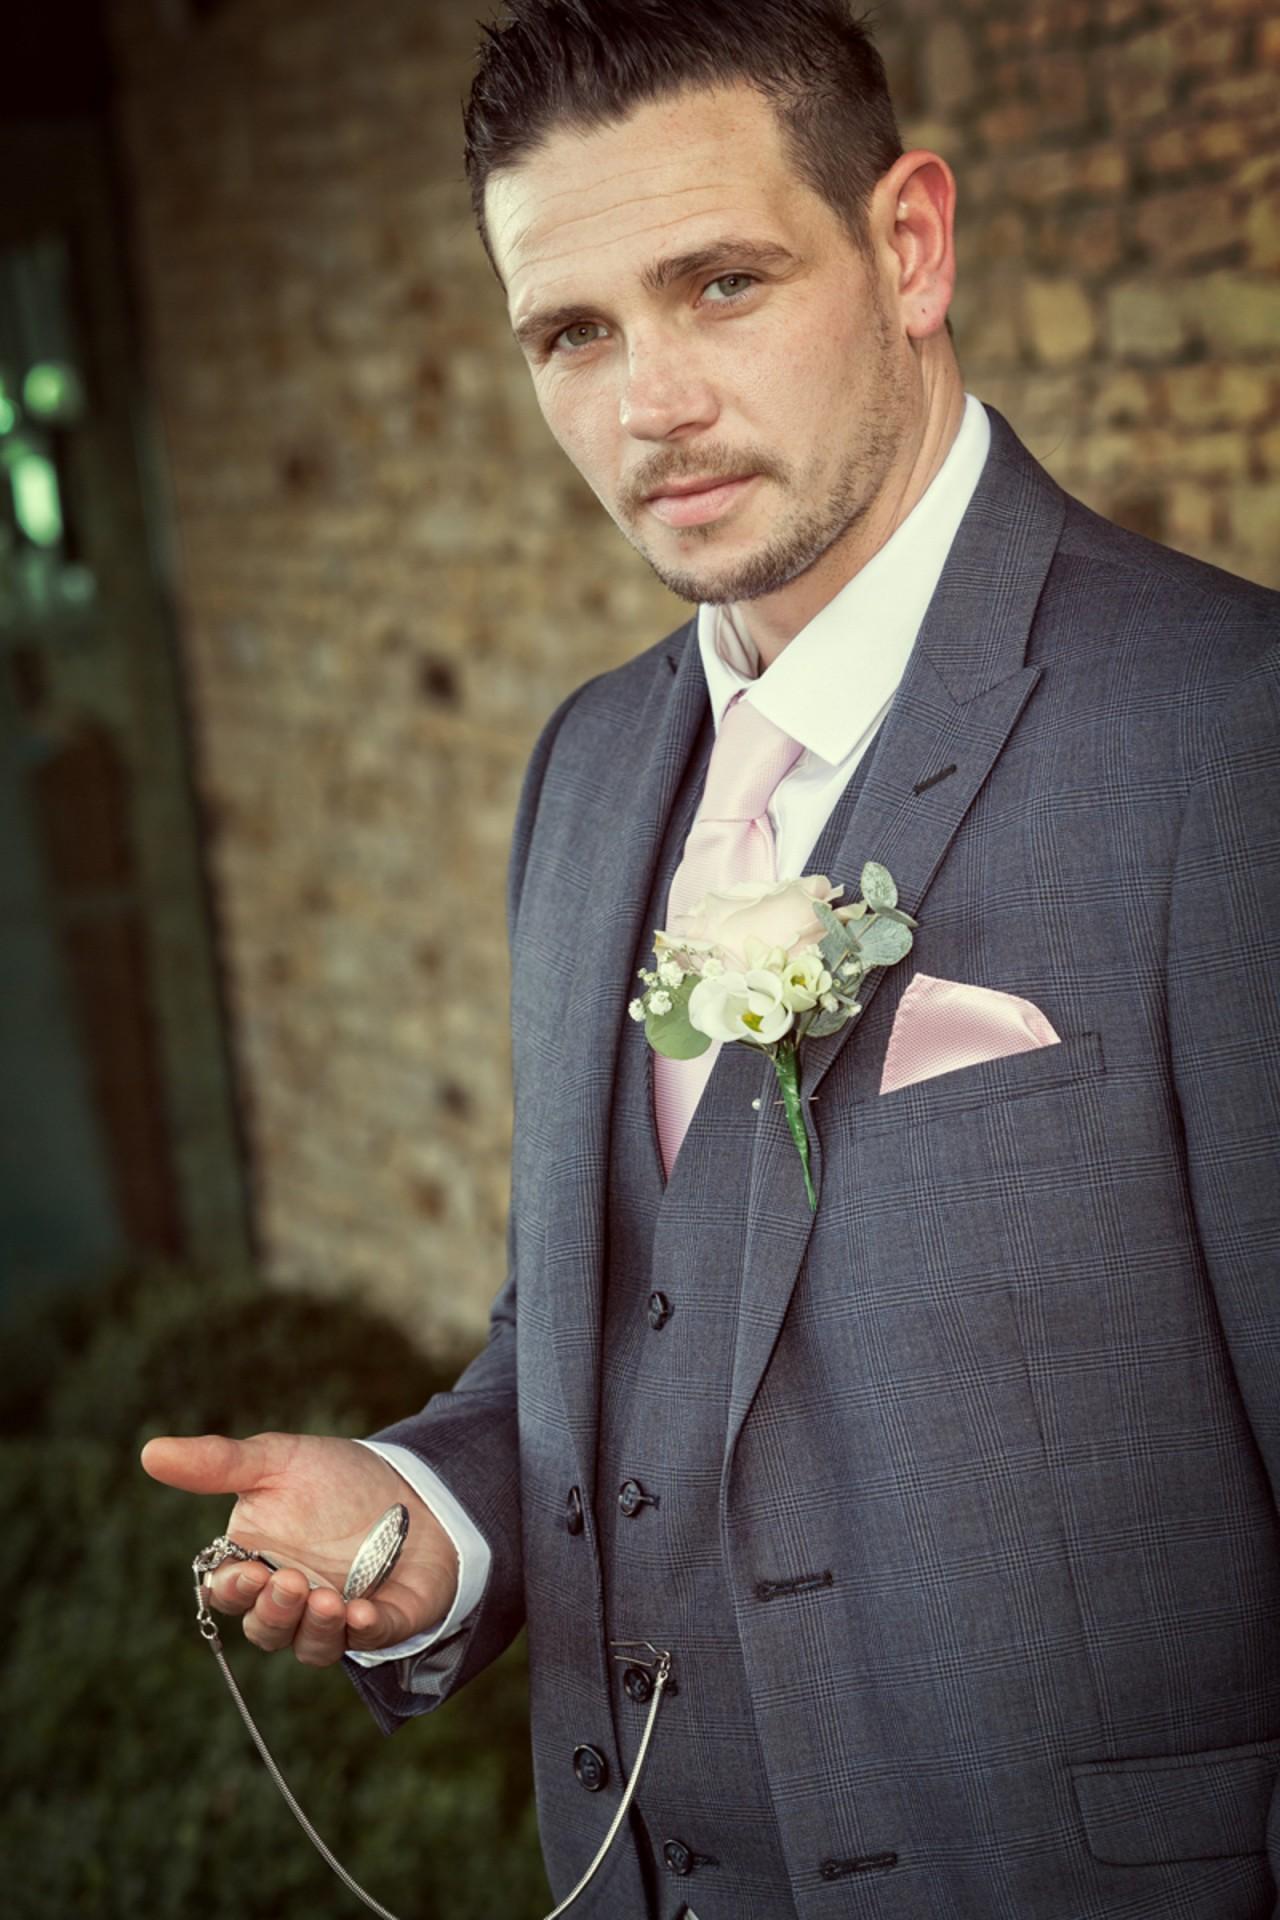 Rachel_Kit_Vintage-Wedding_012